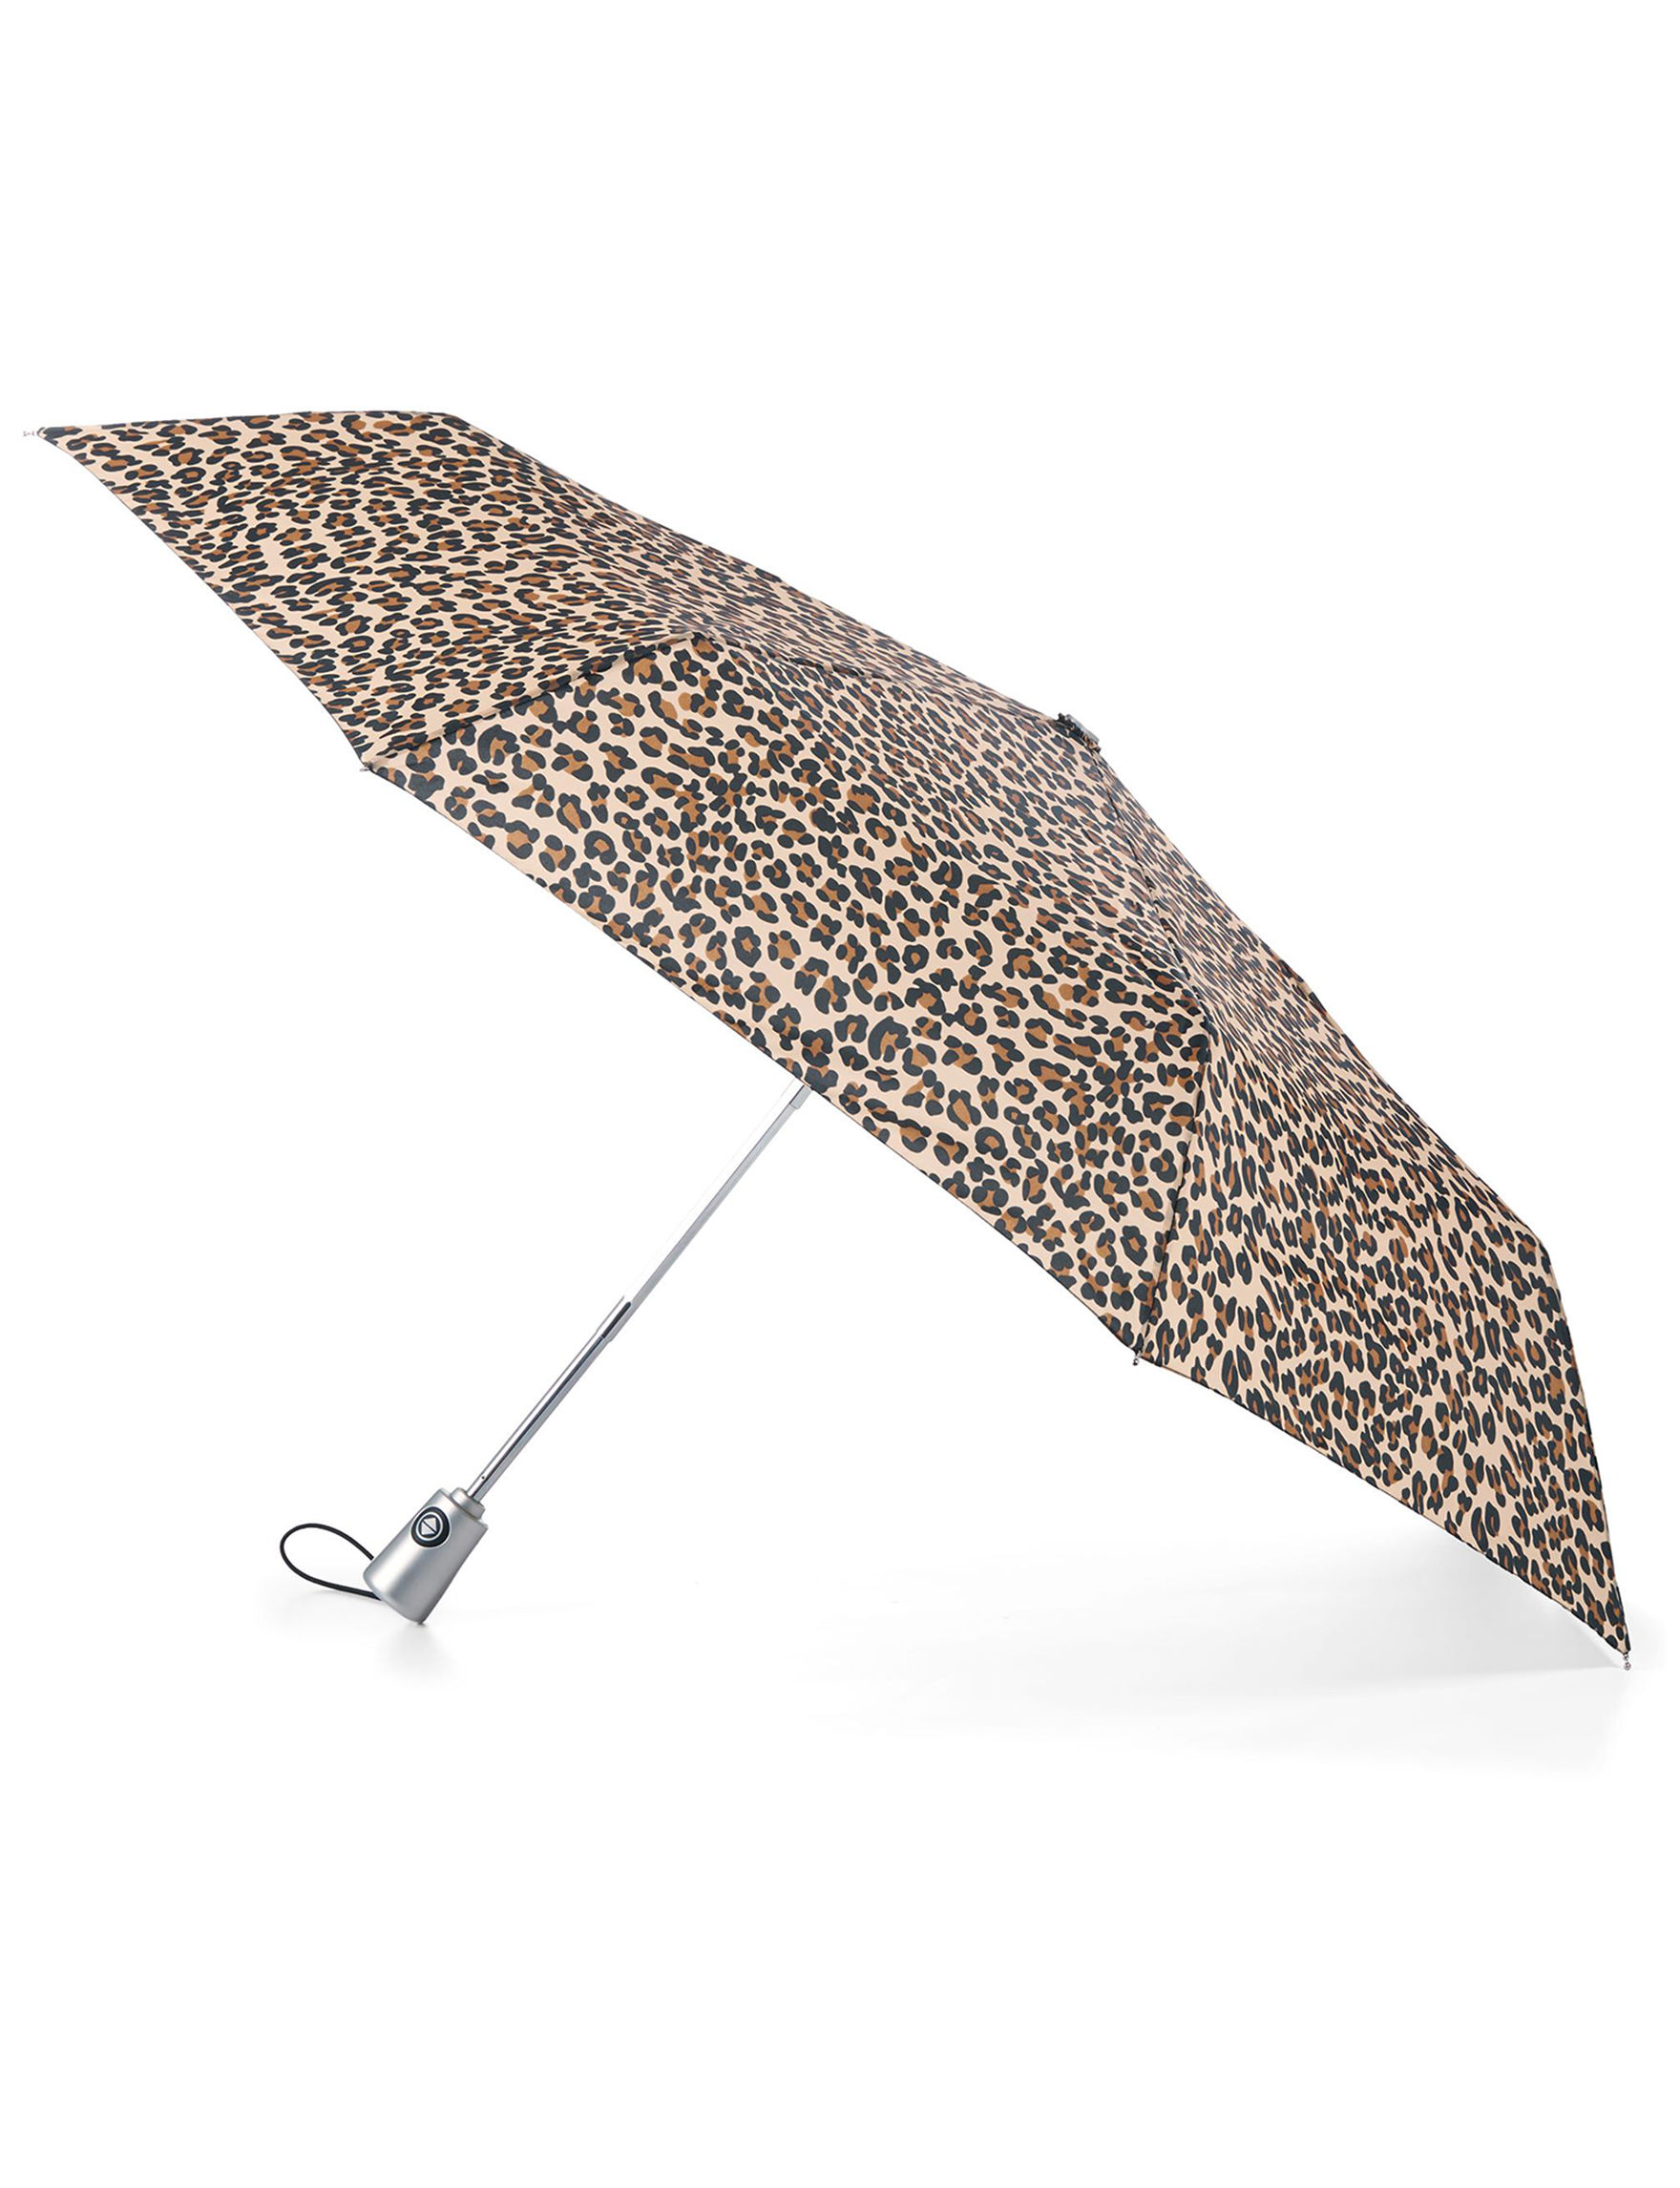 Isotoner Leopard